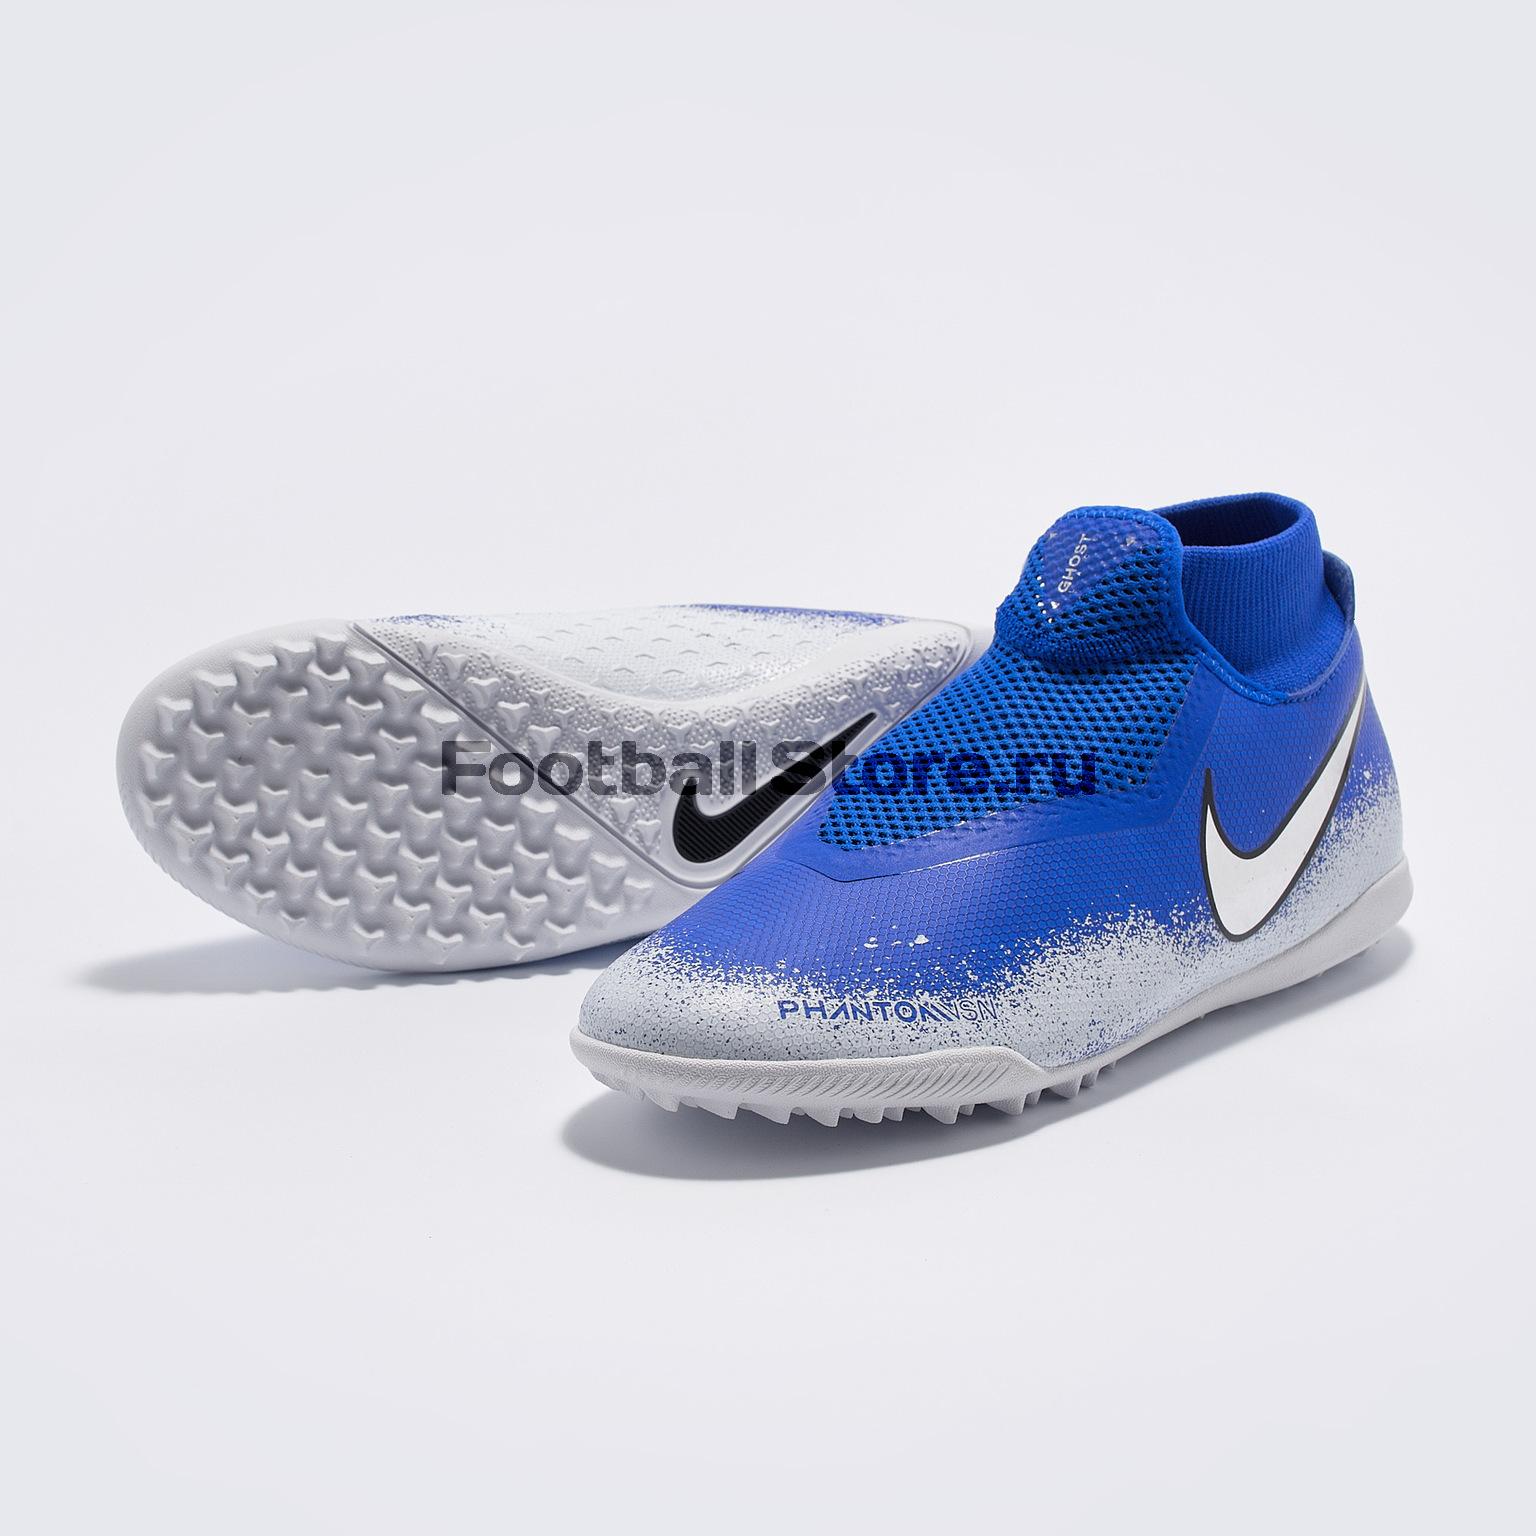 Шиповки Nike Phantom Vision Academy DF TF AO3269-410